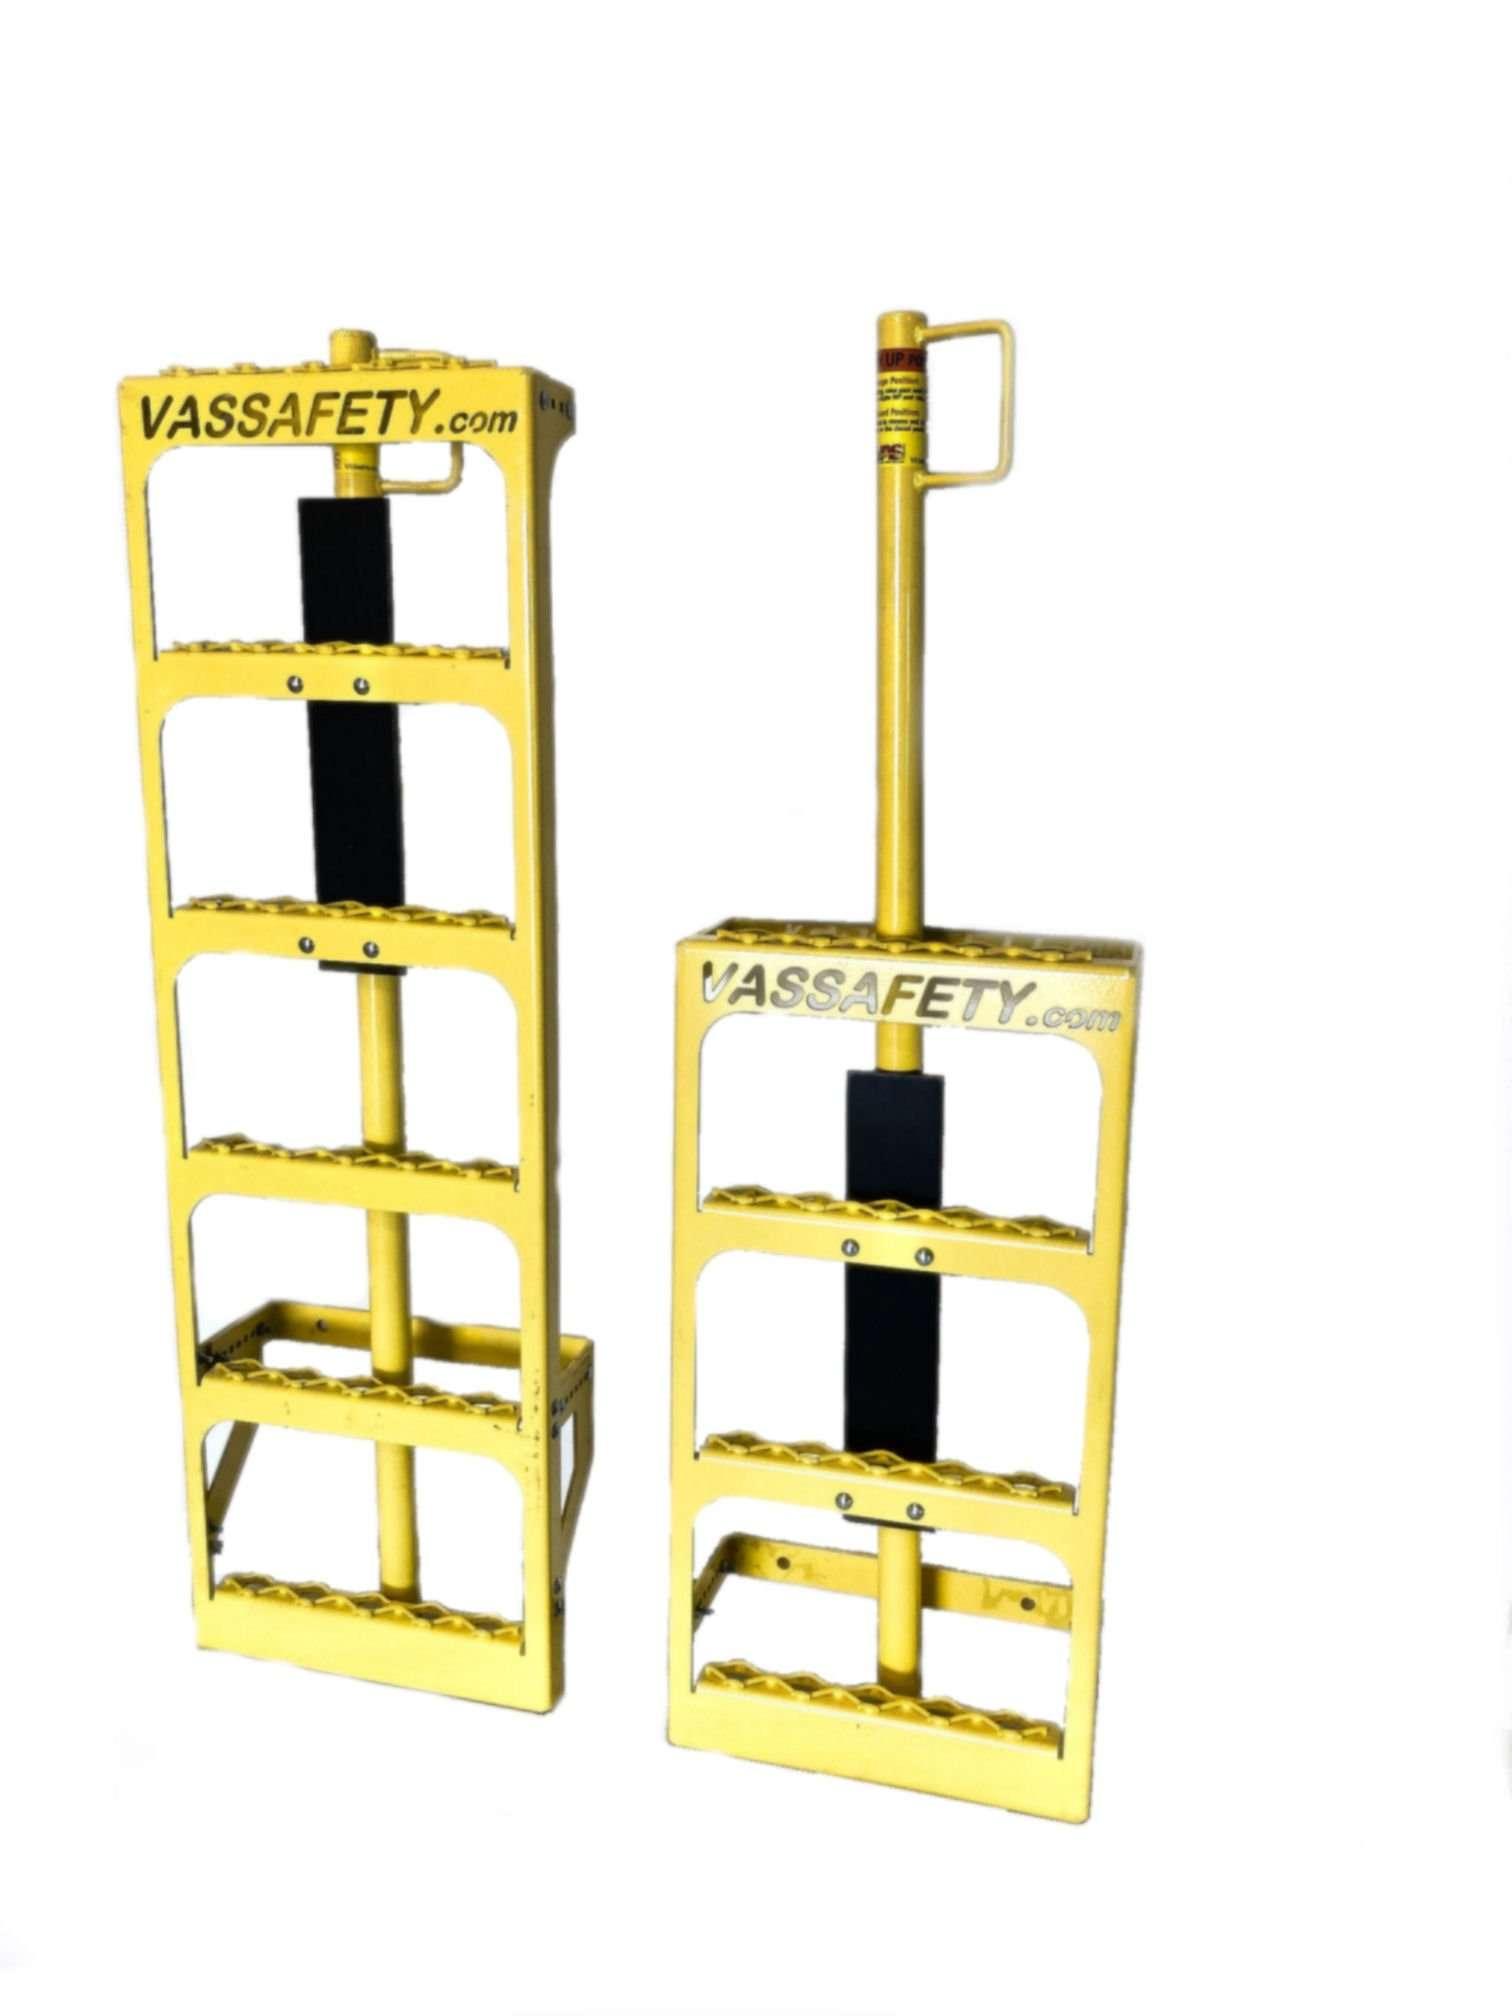 VAS Modular Steel Ladder Accessory